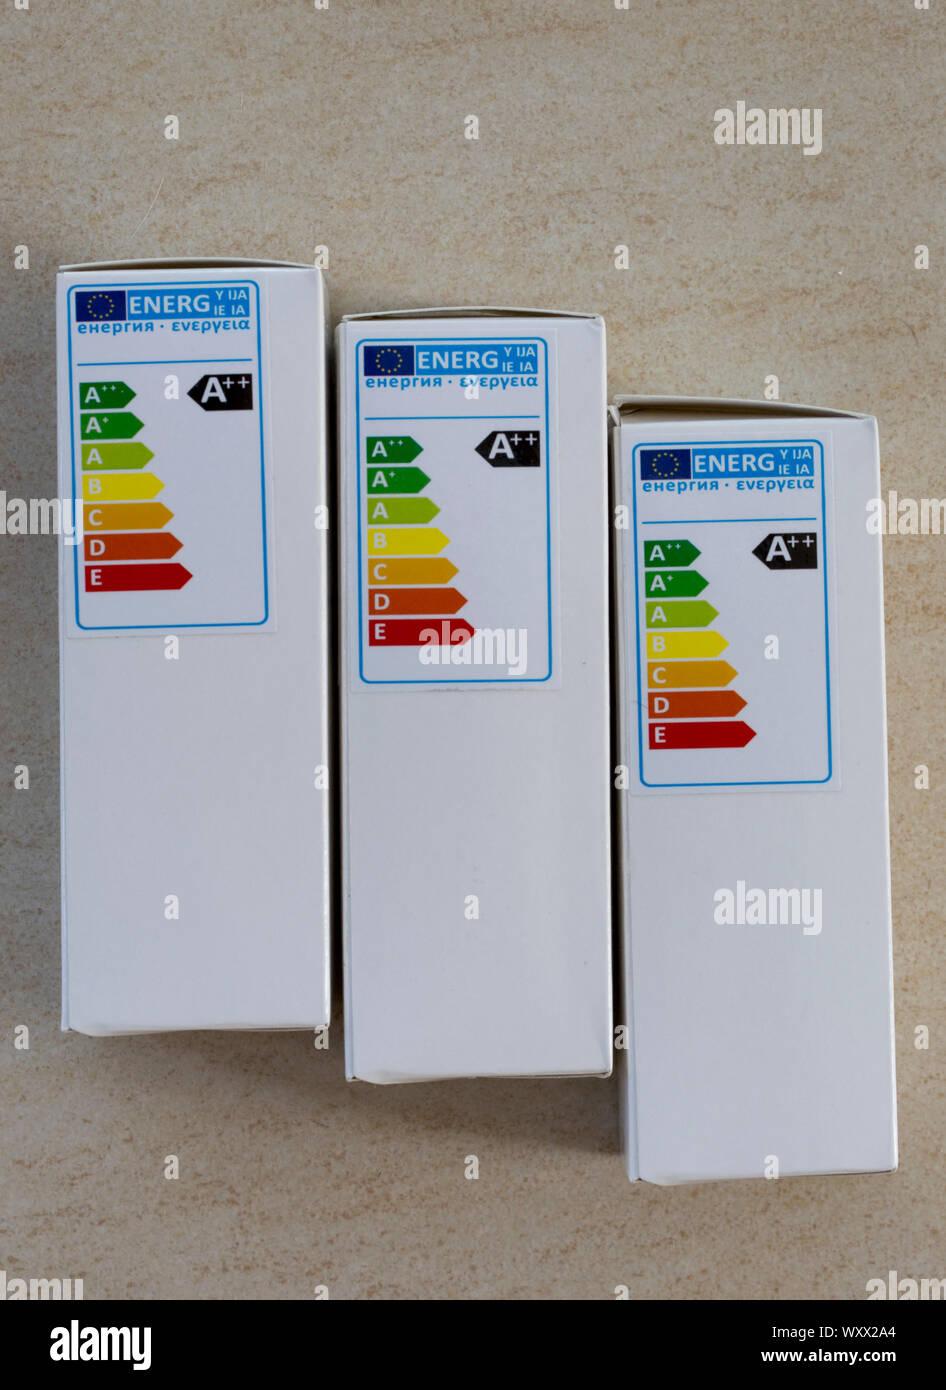 A++ energy efficiency label on LED lamp box UK Stock Photo